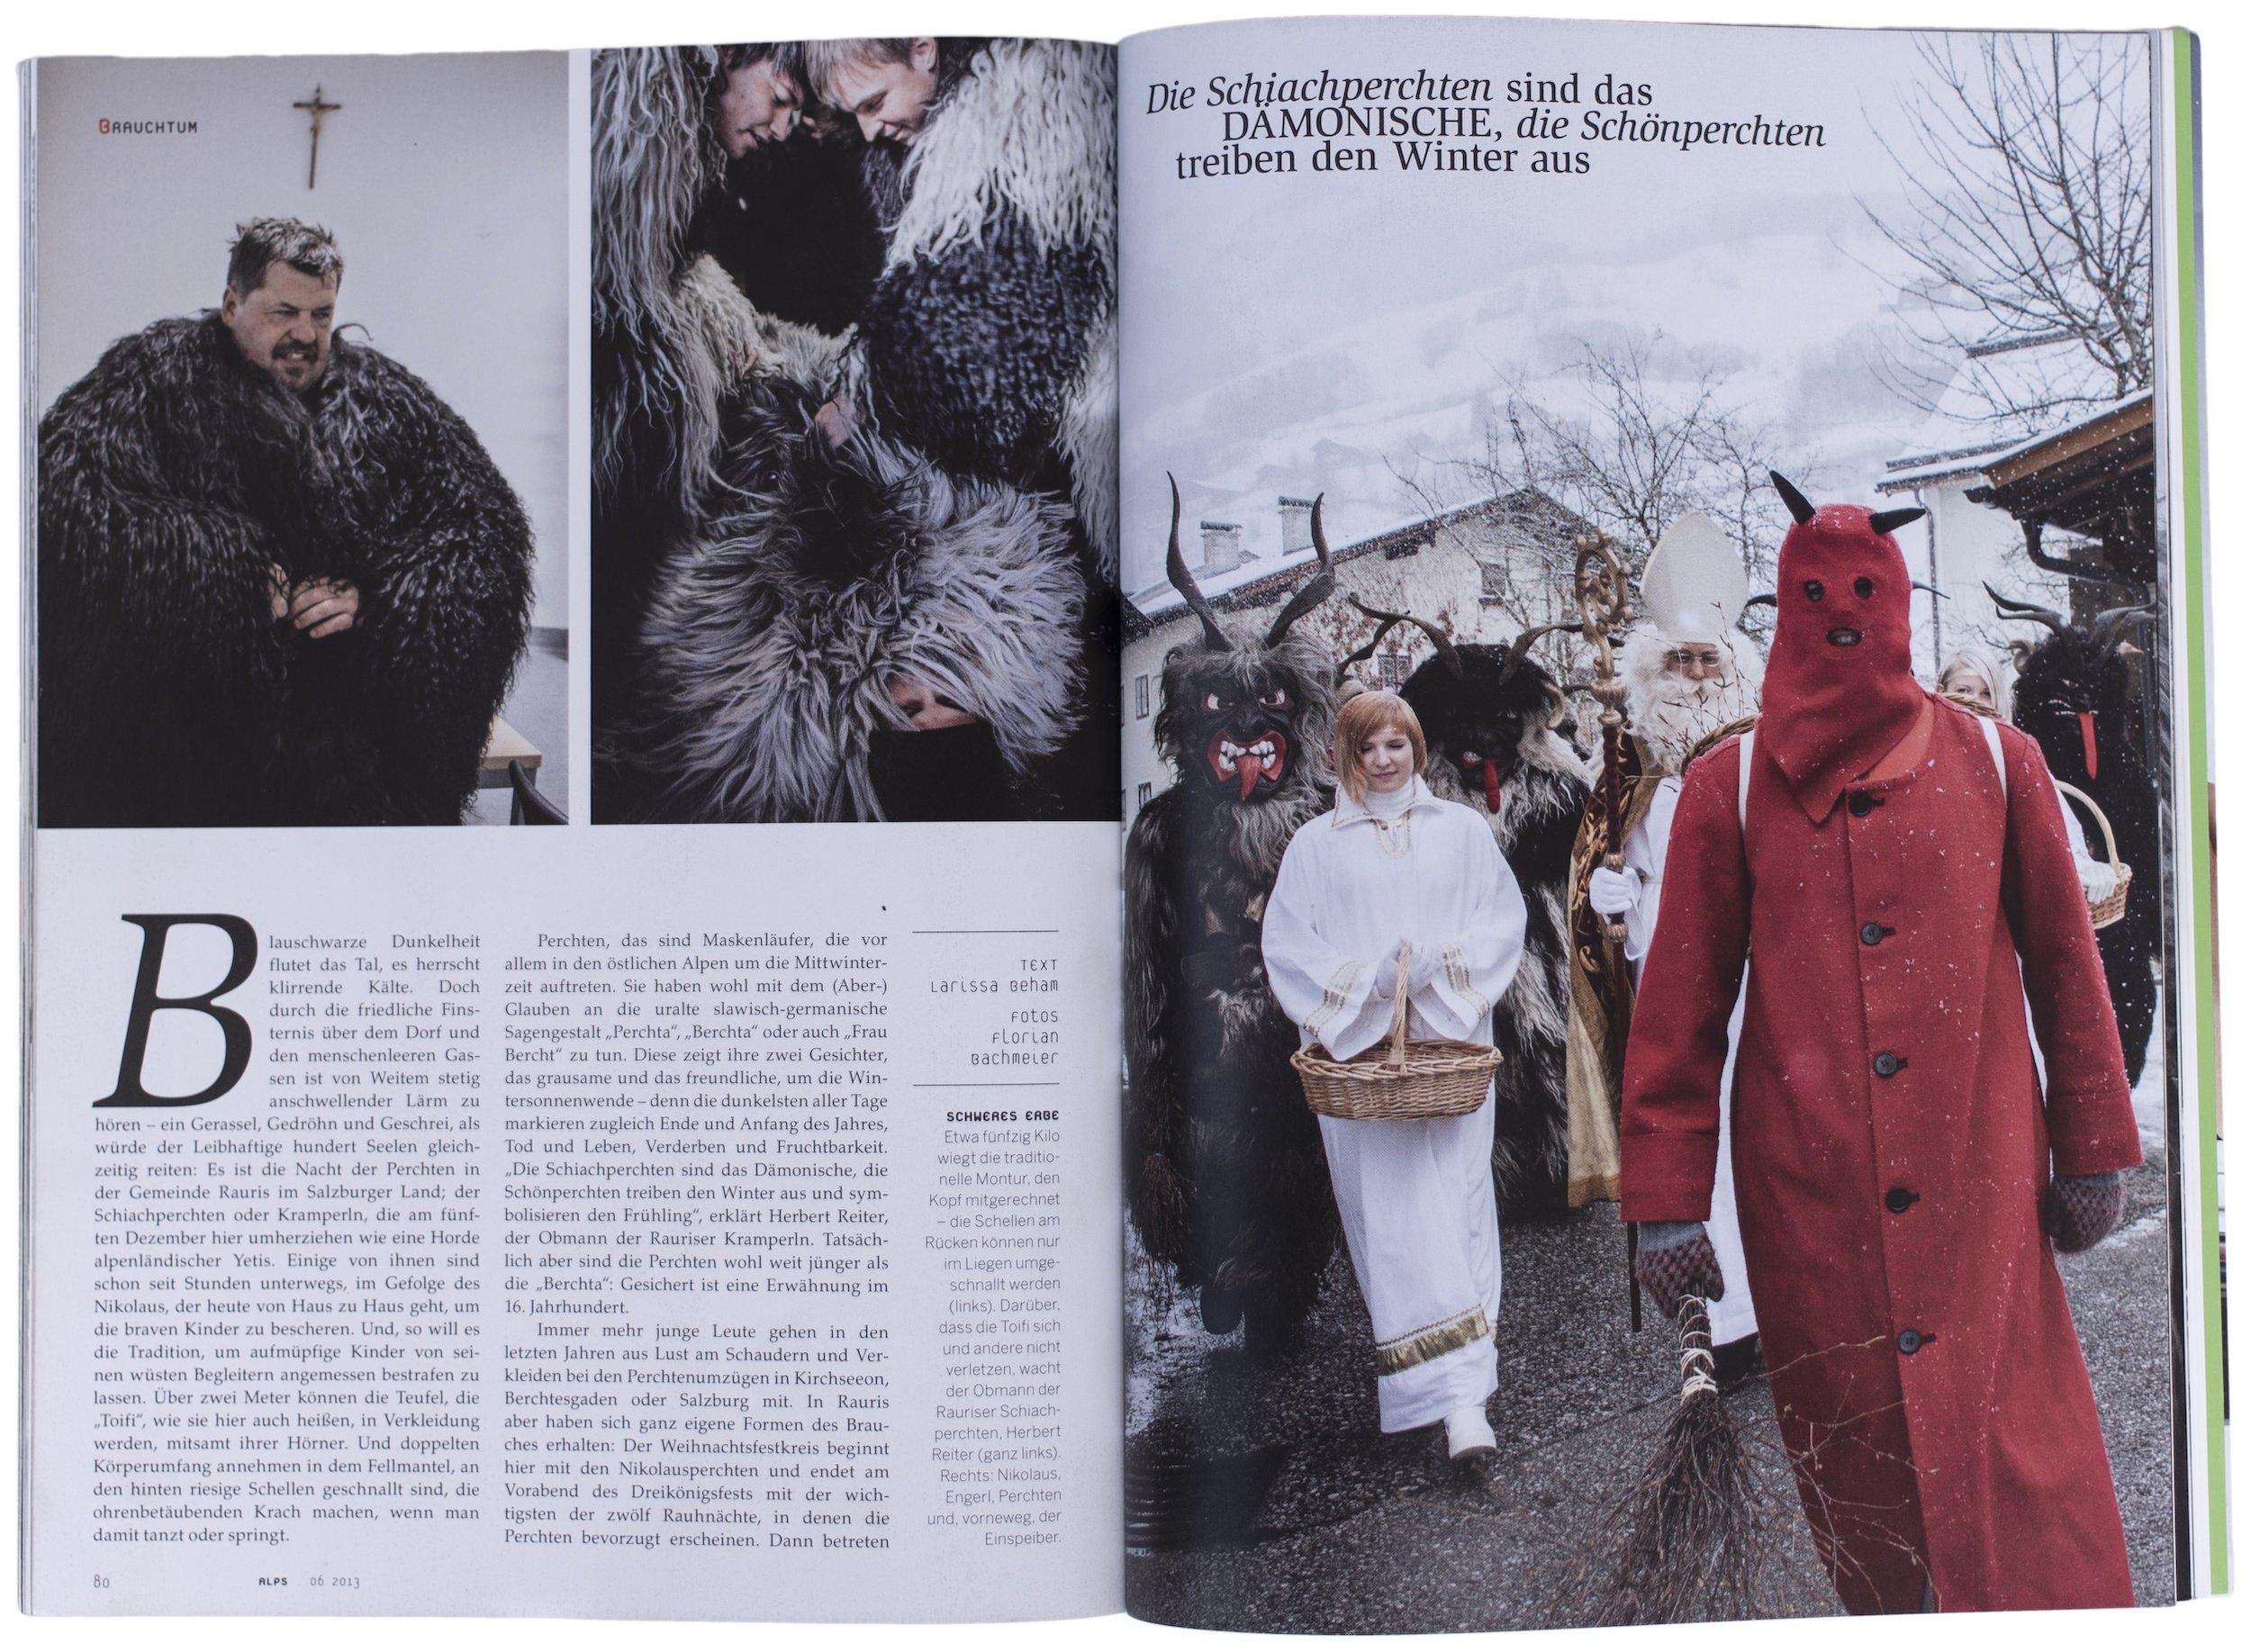 ALPS Magazine, Juni 2013